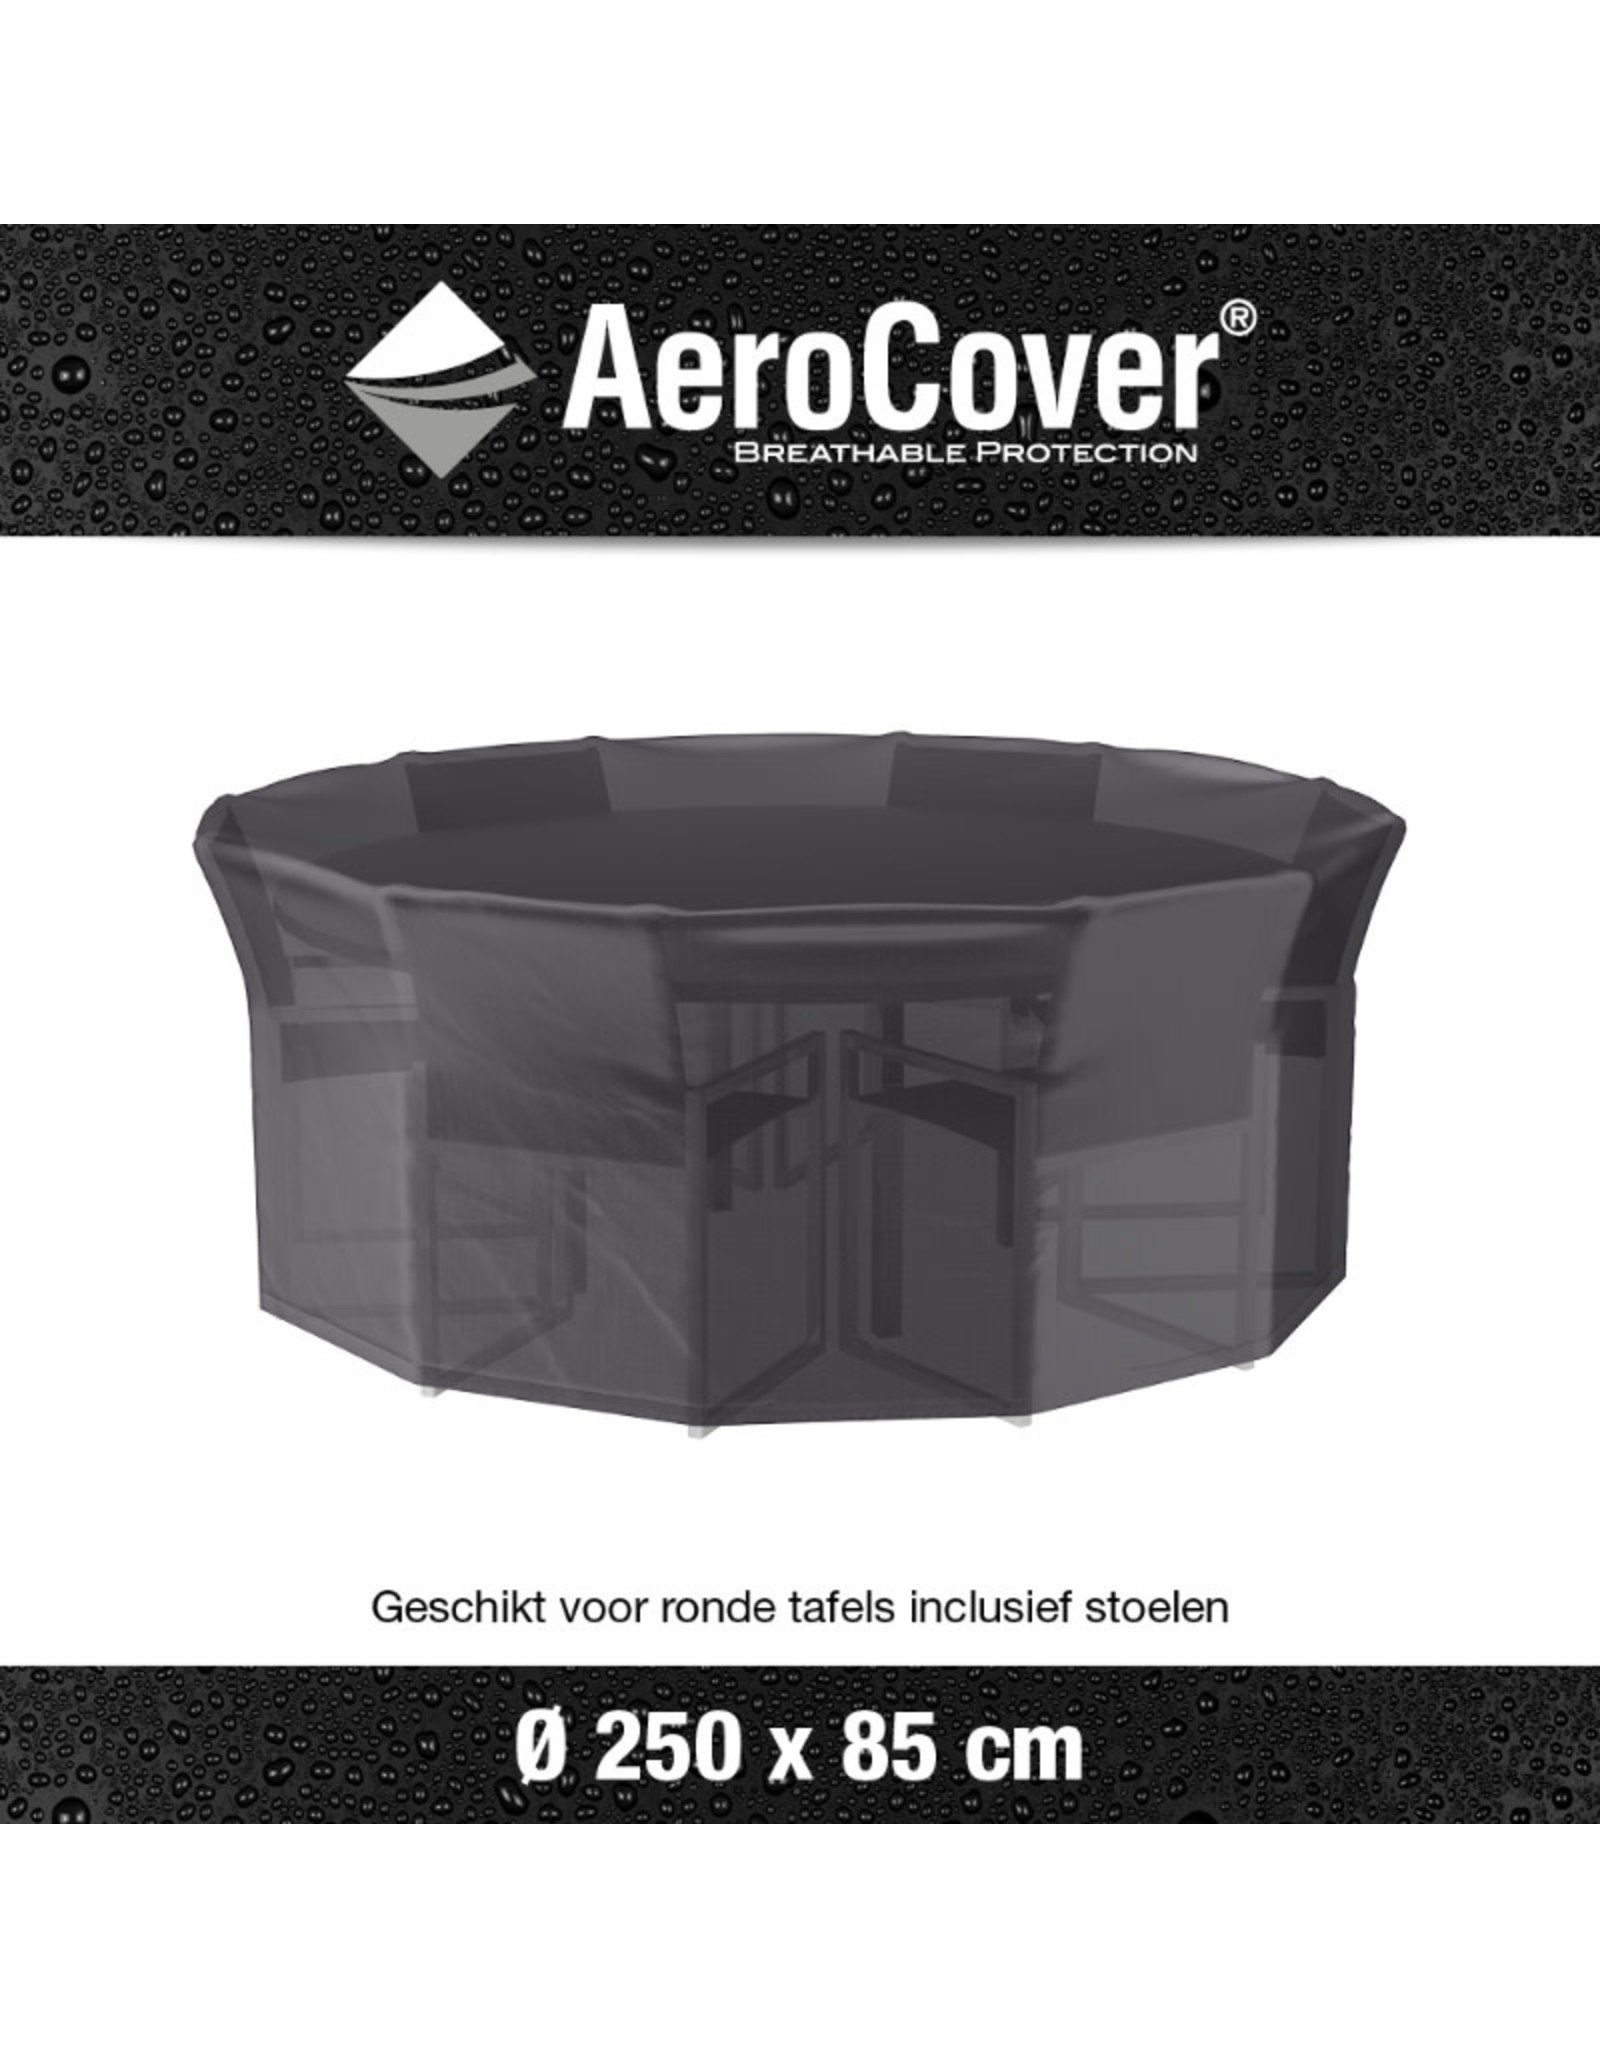 Aerocover Aerocover cover 250x85H cm around 7919